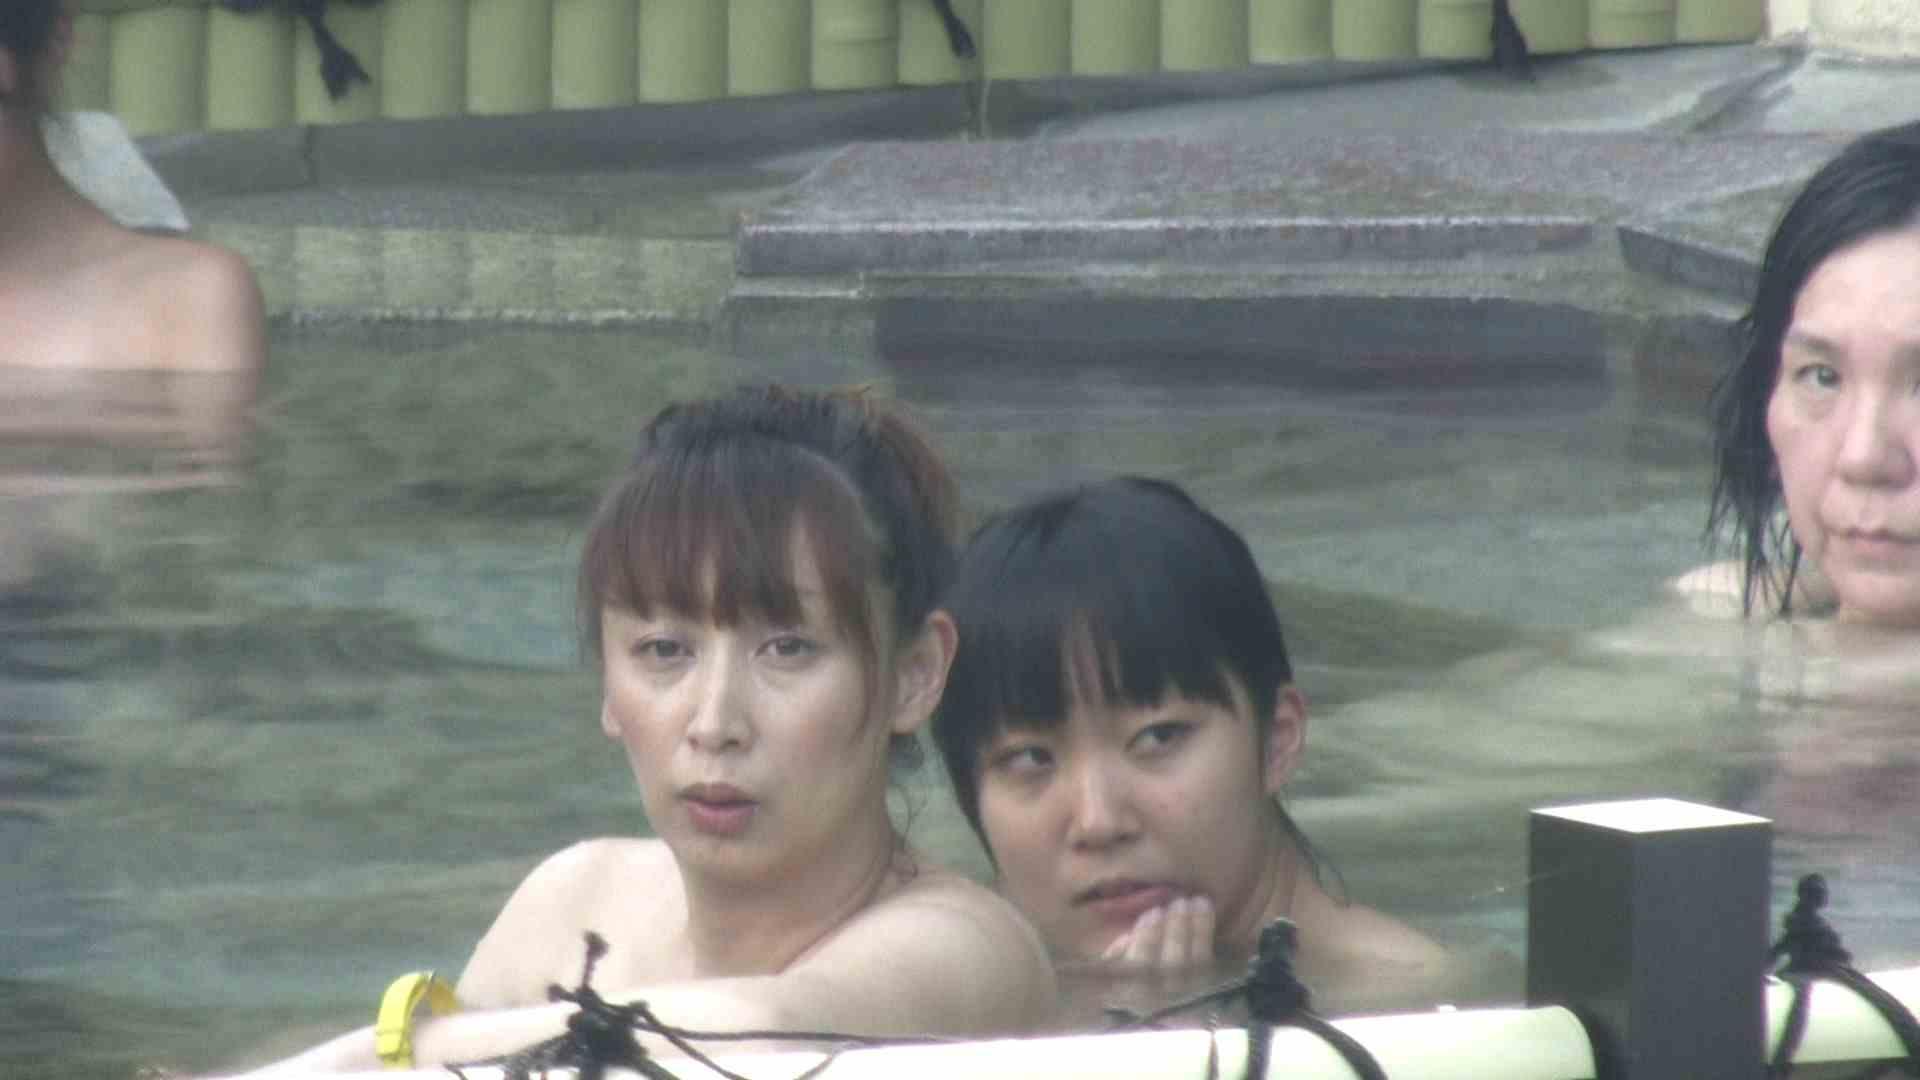 Aquaな露天風呂Vol.196 HなOL | 盗撮  91pic 1